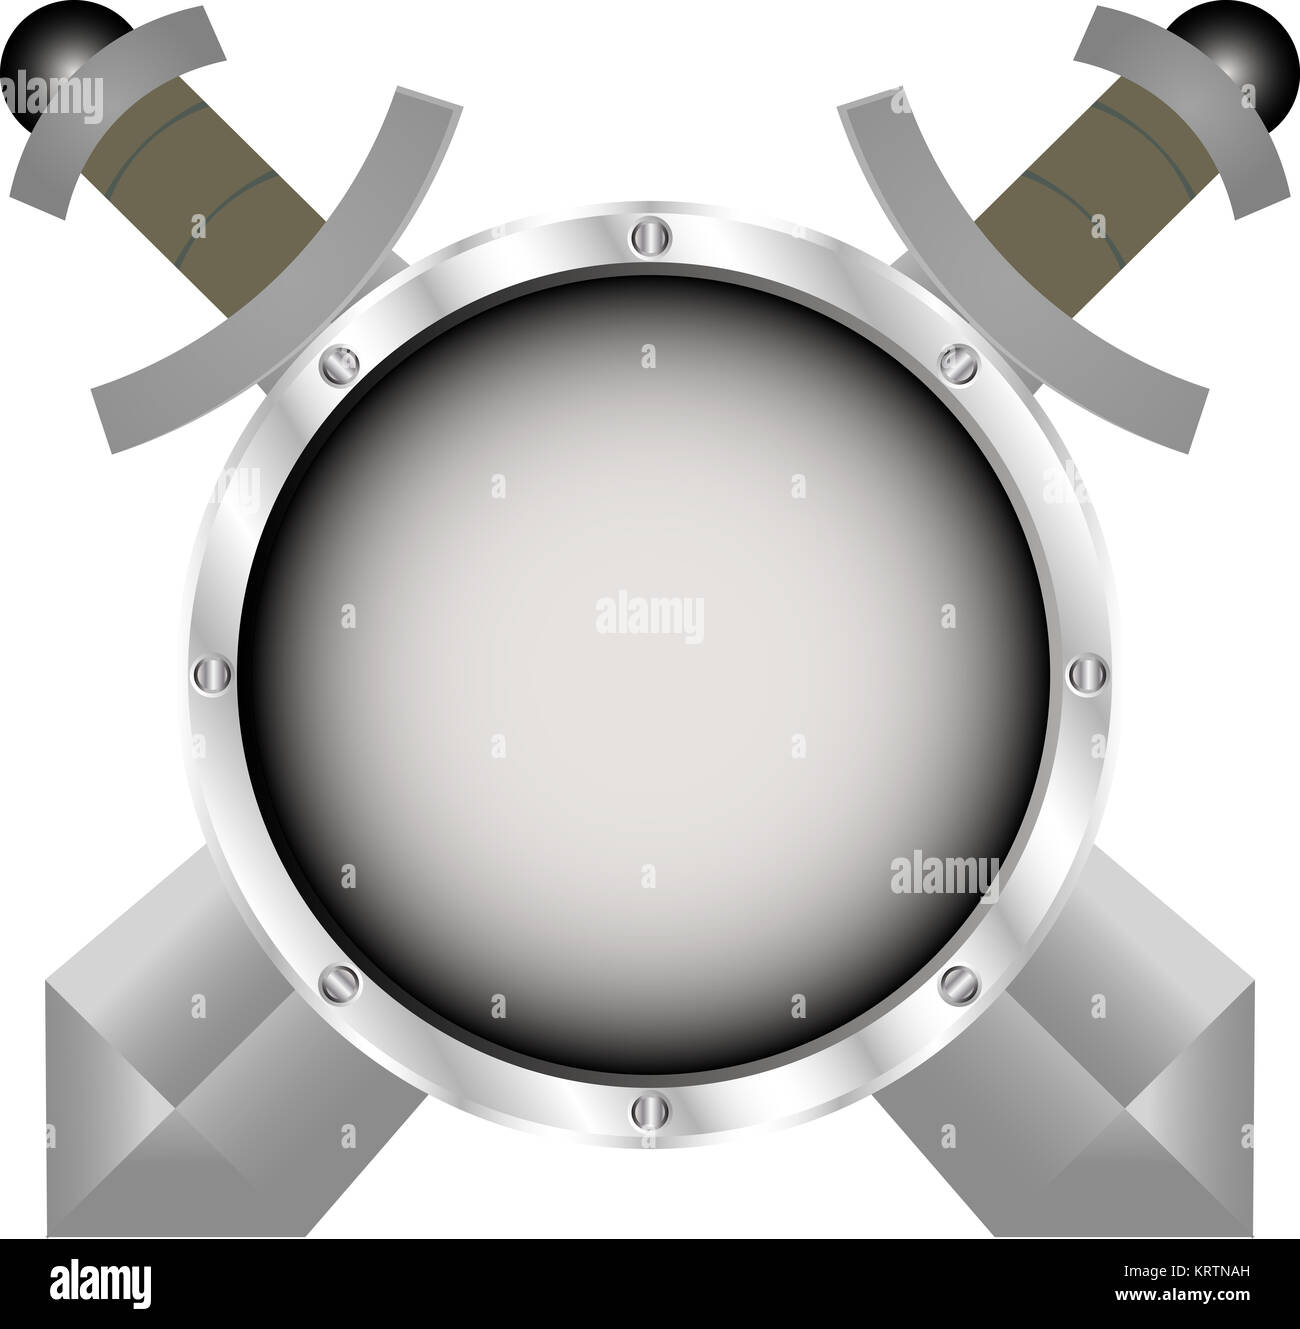 Shield logo icon design template elements Stock Photo: 169574009 - Alamy